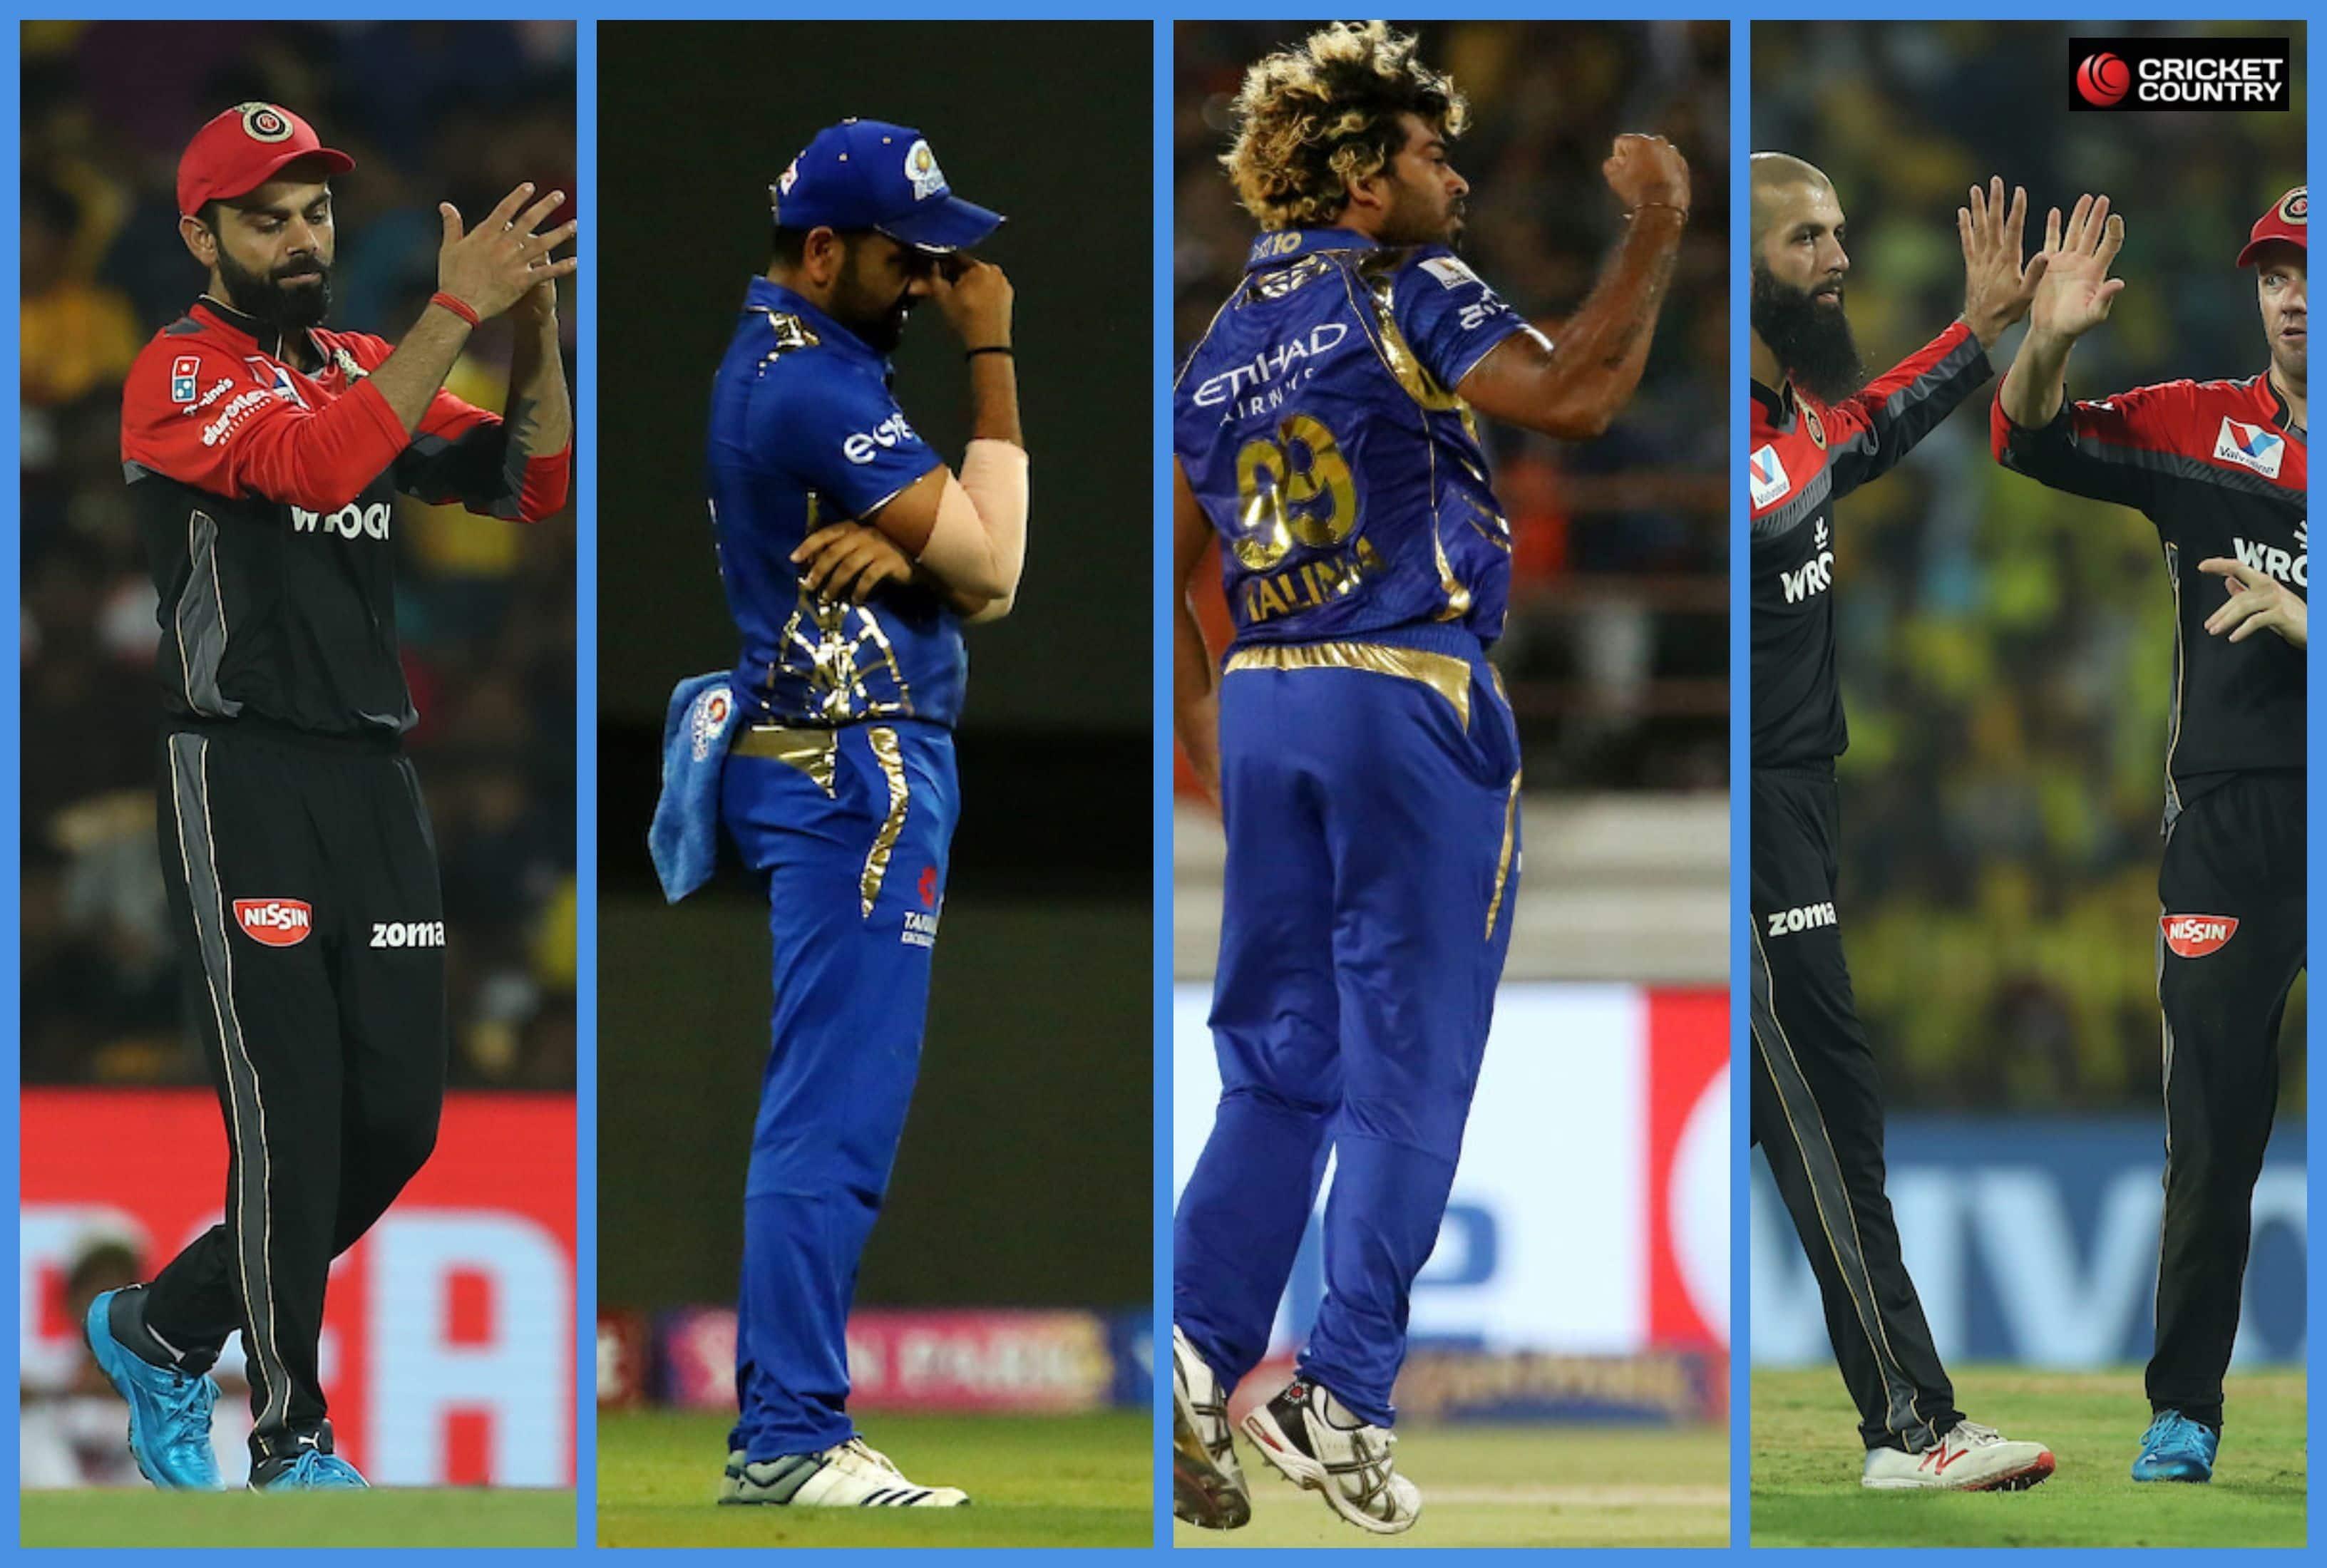 Bangalore vs Mumbai: What can we expect from Kohli and Rohit?